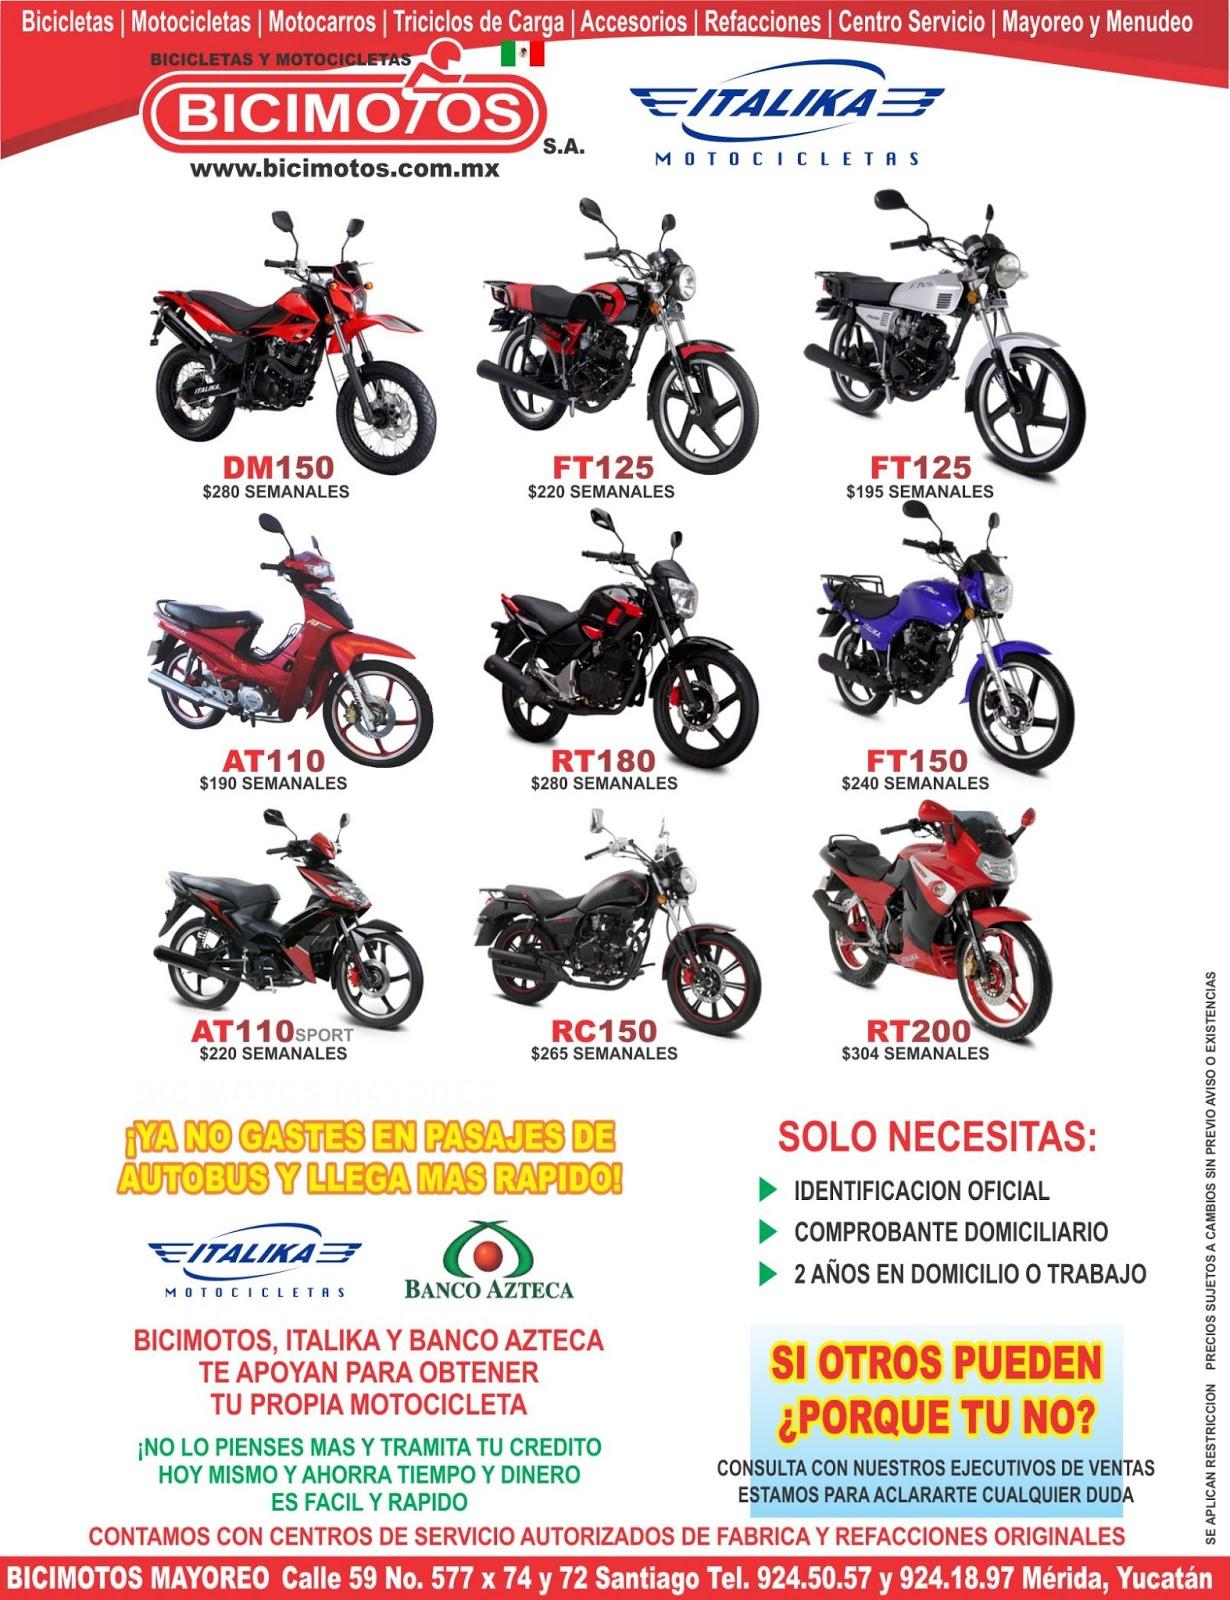 Motocicletas italika a credito paguitos semanales